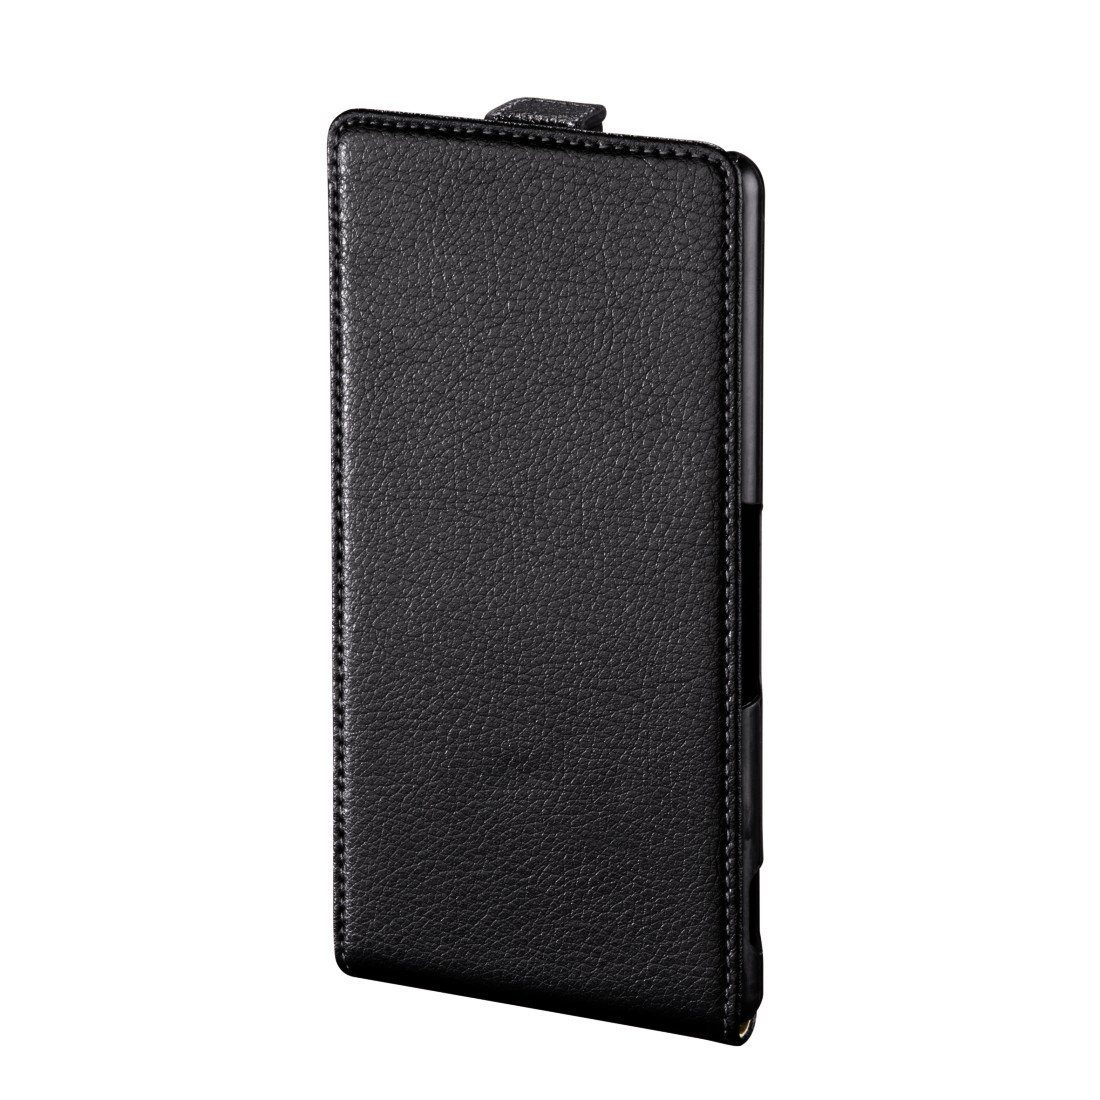 Hama Flap-Tasche Smart Case für Sony Xperia M4 Aqua, Schwarz